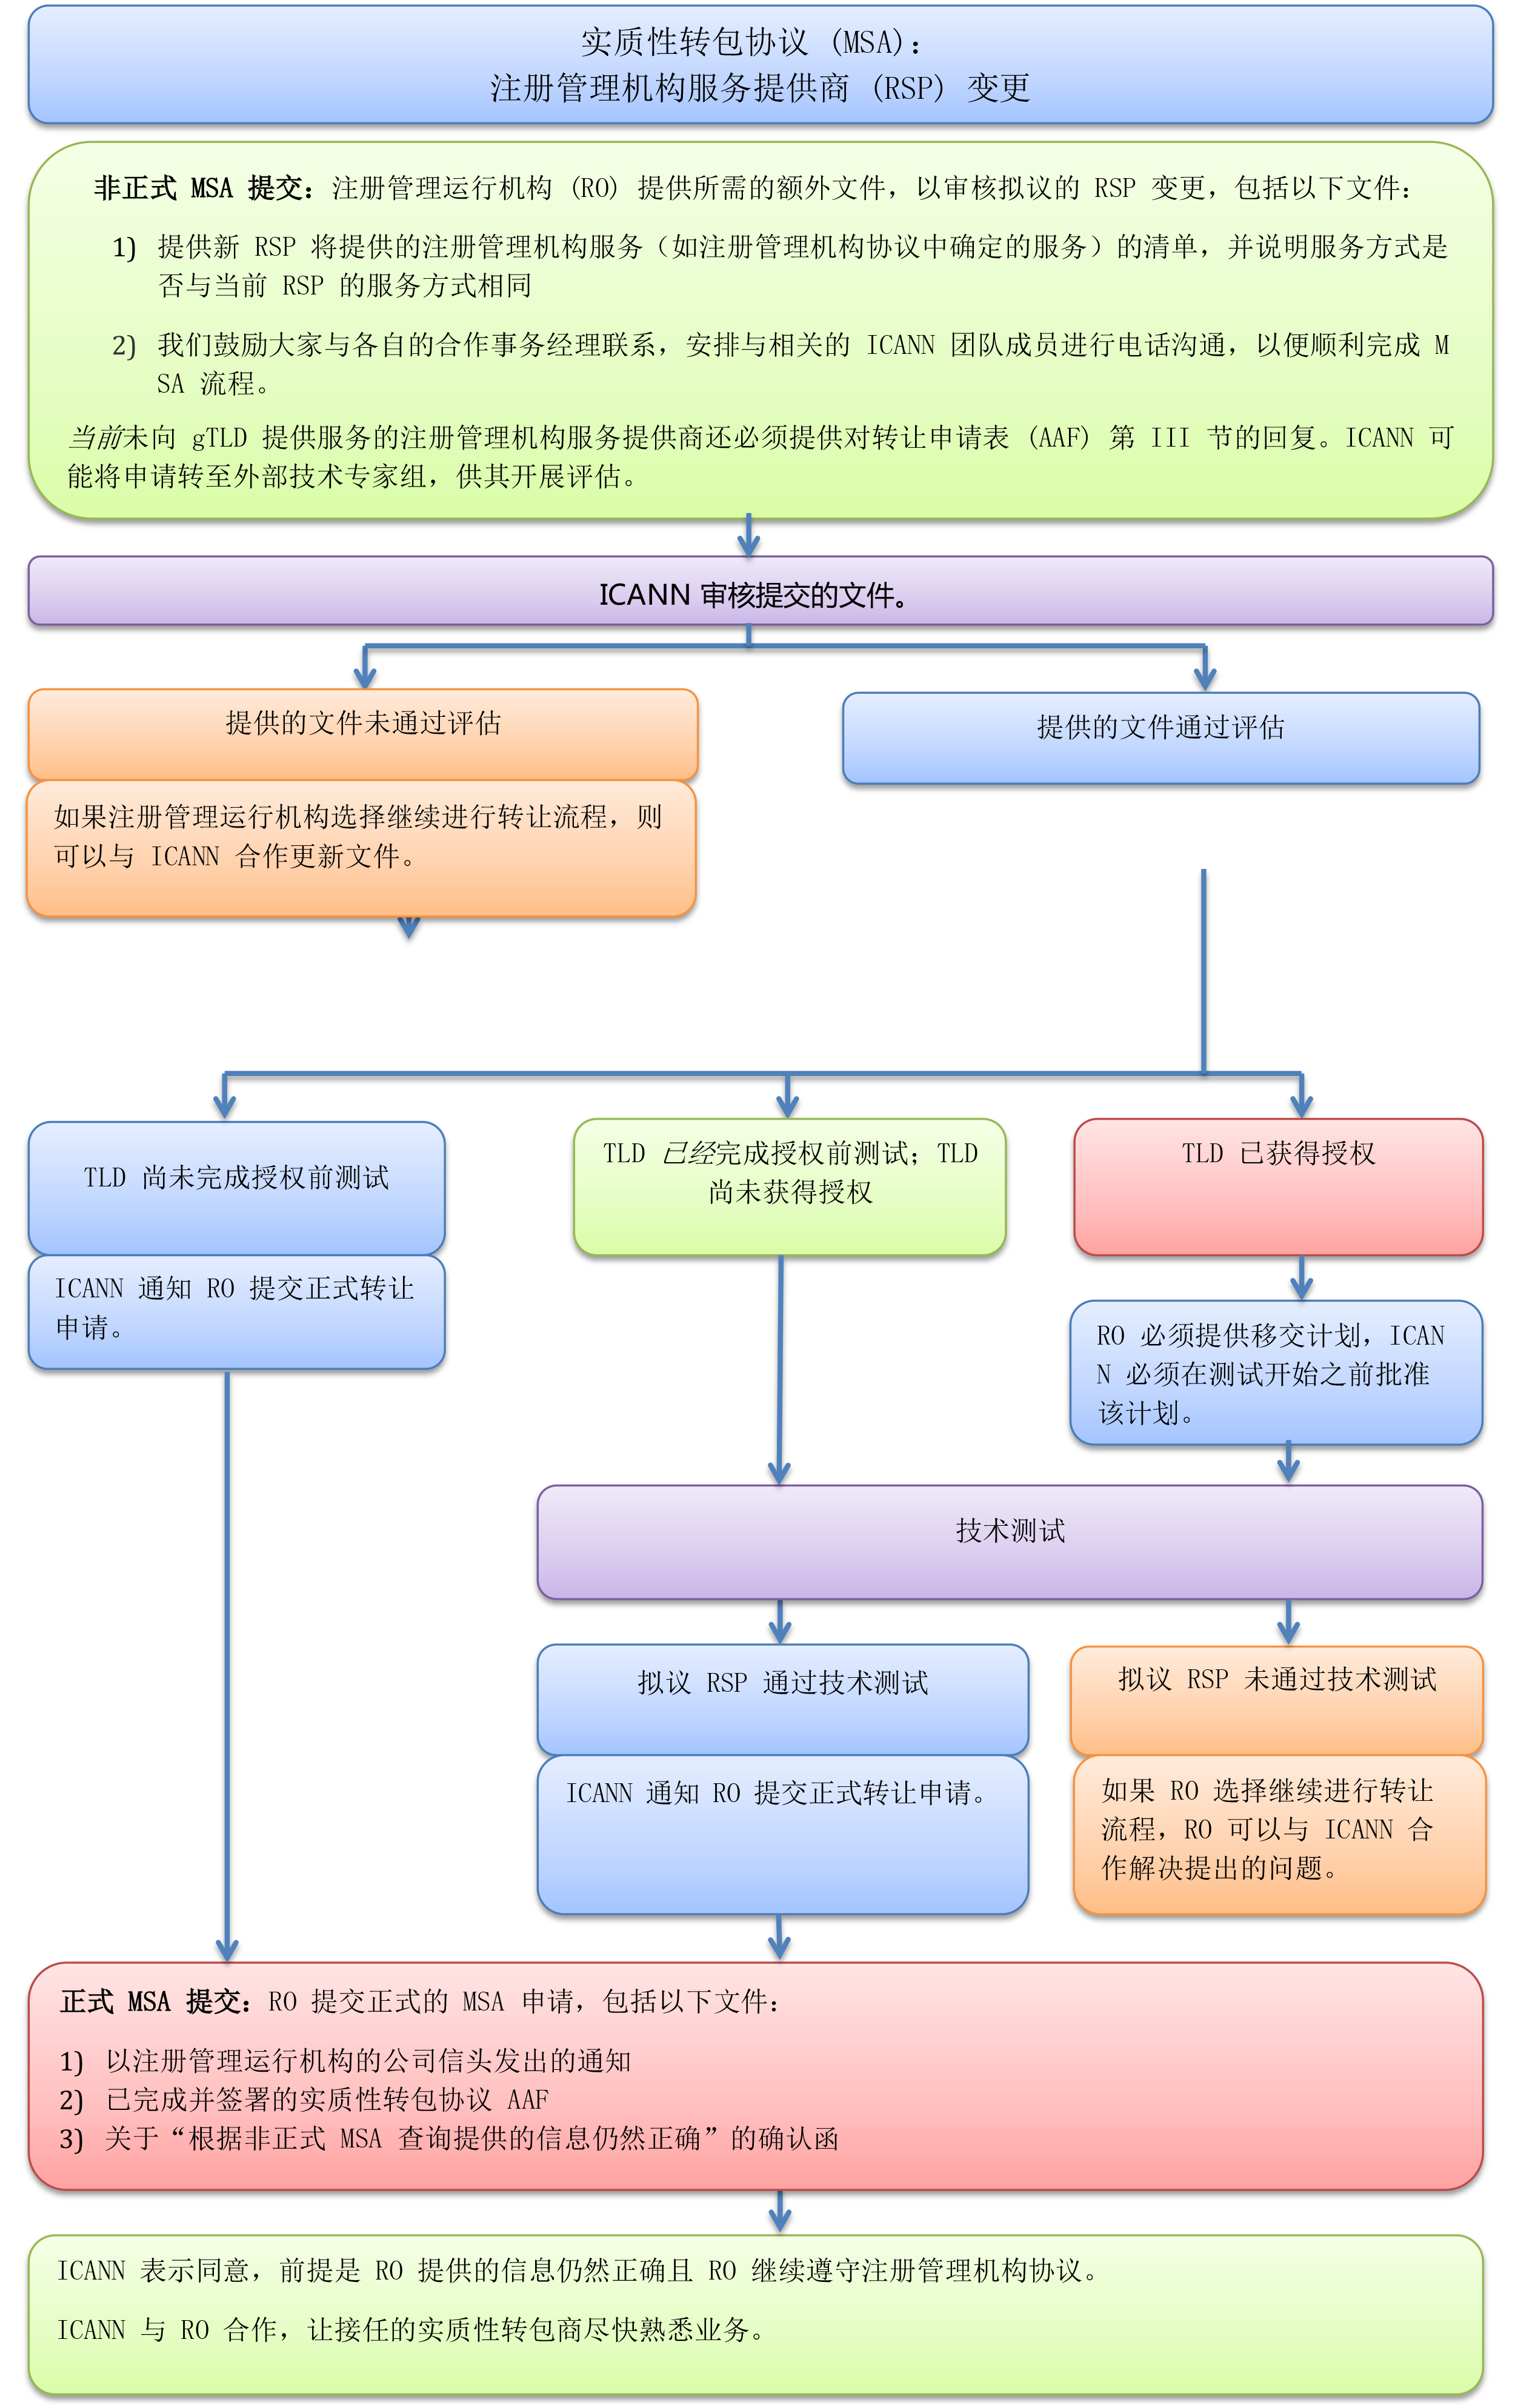 Material Subcontracting Arrangement (MSA): Change of Registry Service Provider (RSP)